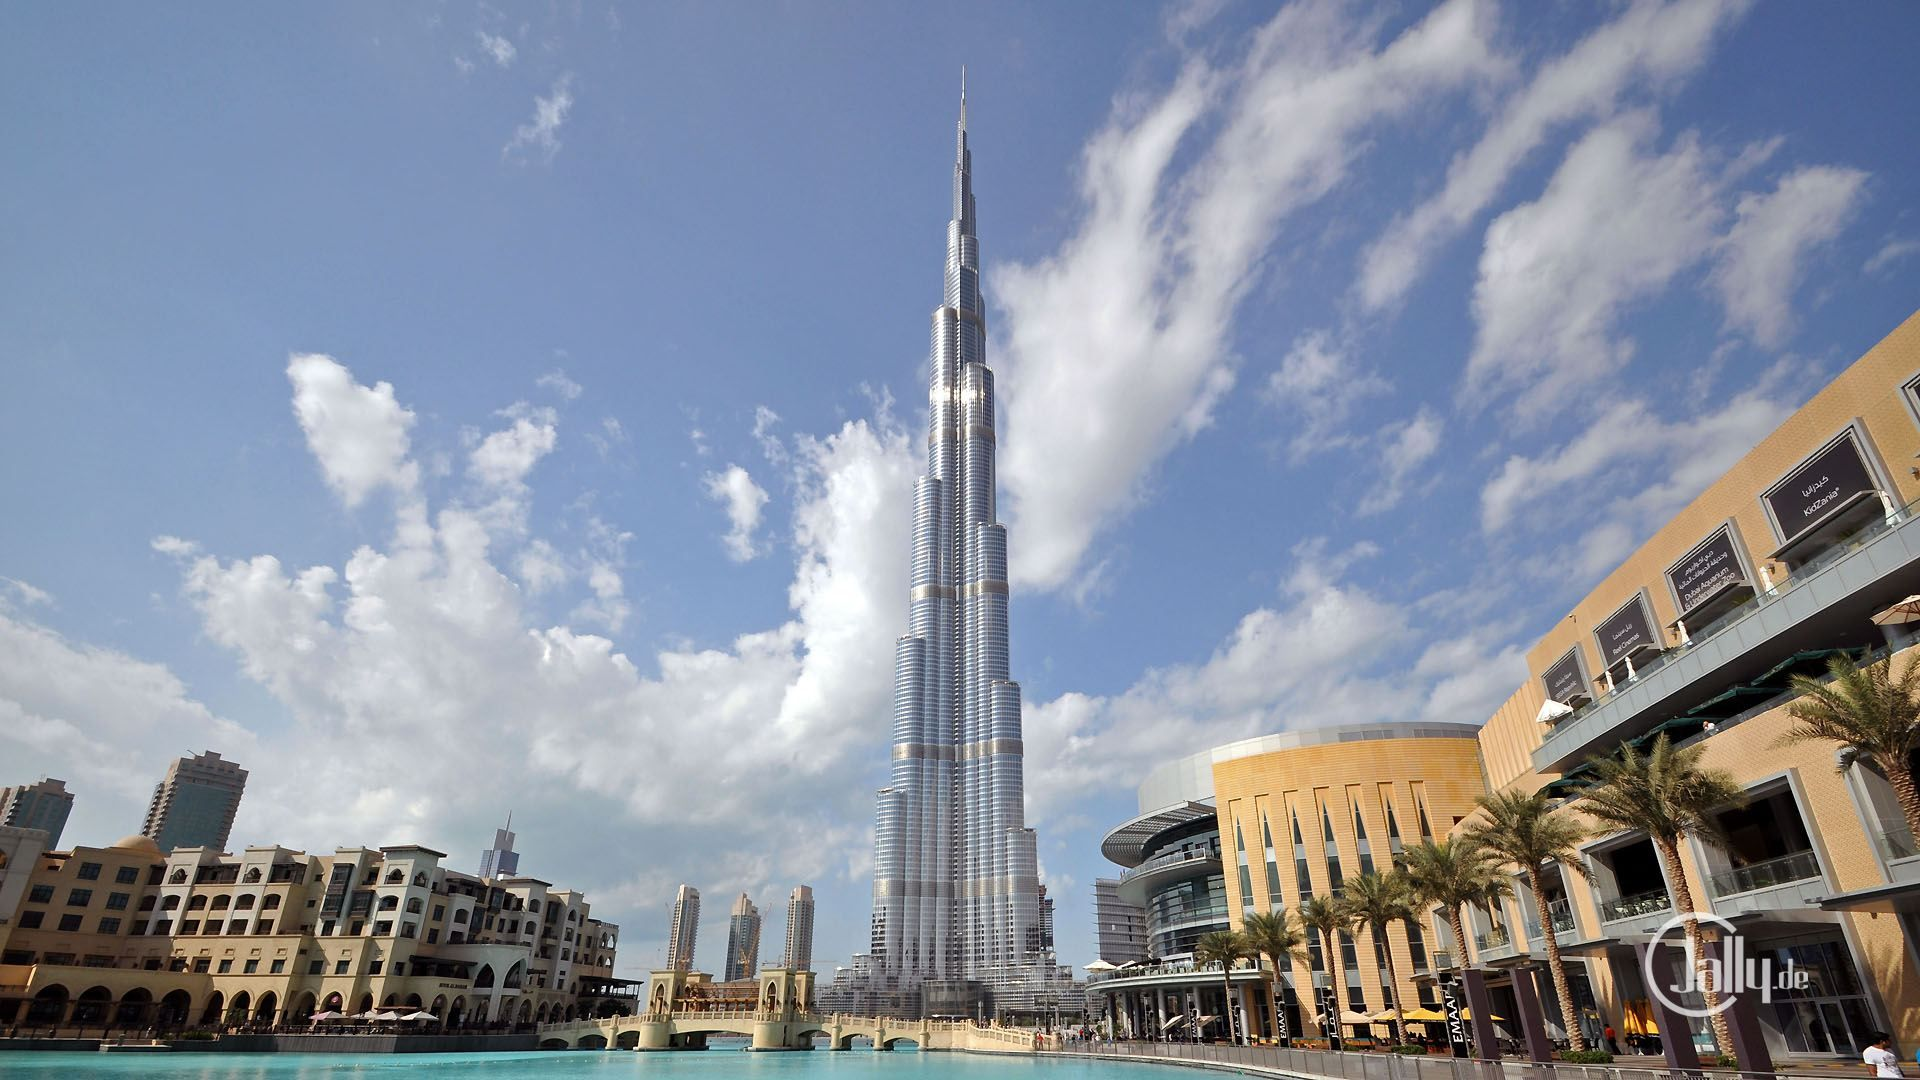 Dubai Burj Khalifa Wallpaper For Iphone 5 6 Plus Cities